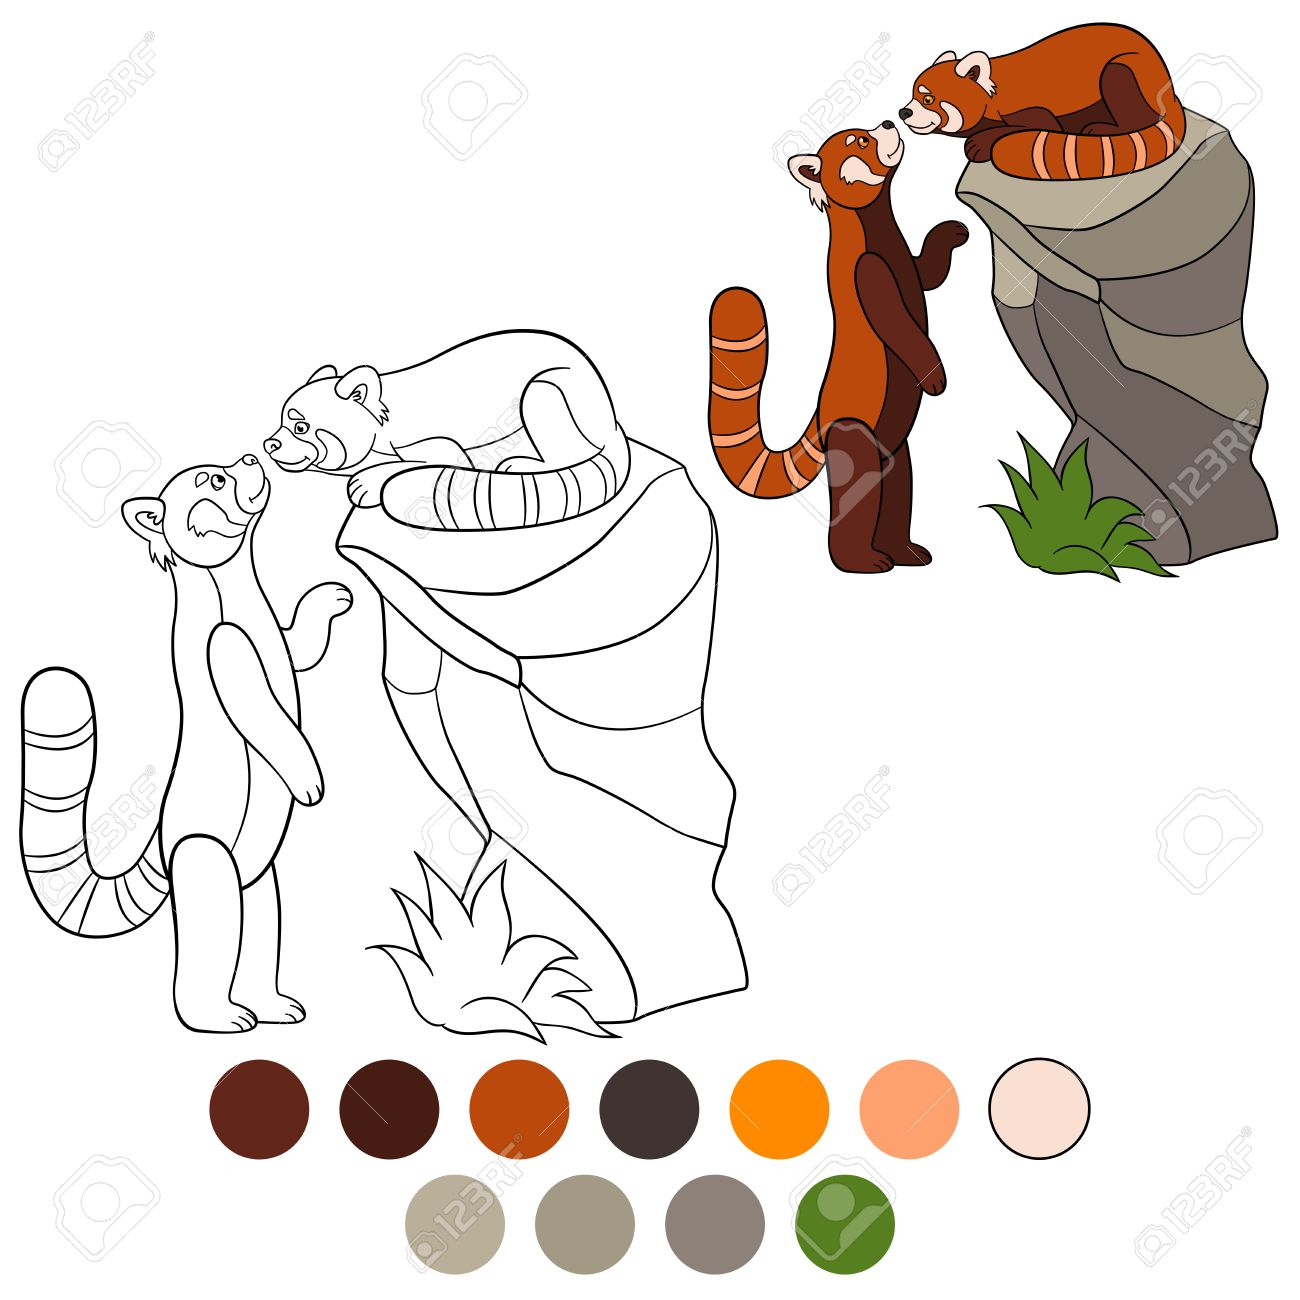 Dibujo Para Colorear Panda Rojo Dos Pequeños Osos Panda Lindo Rojo Sonrisa